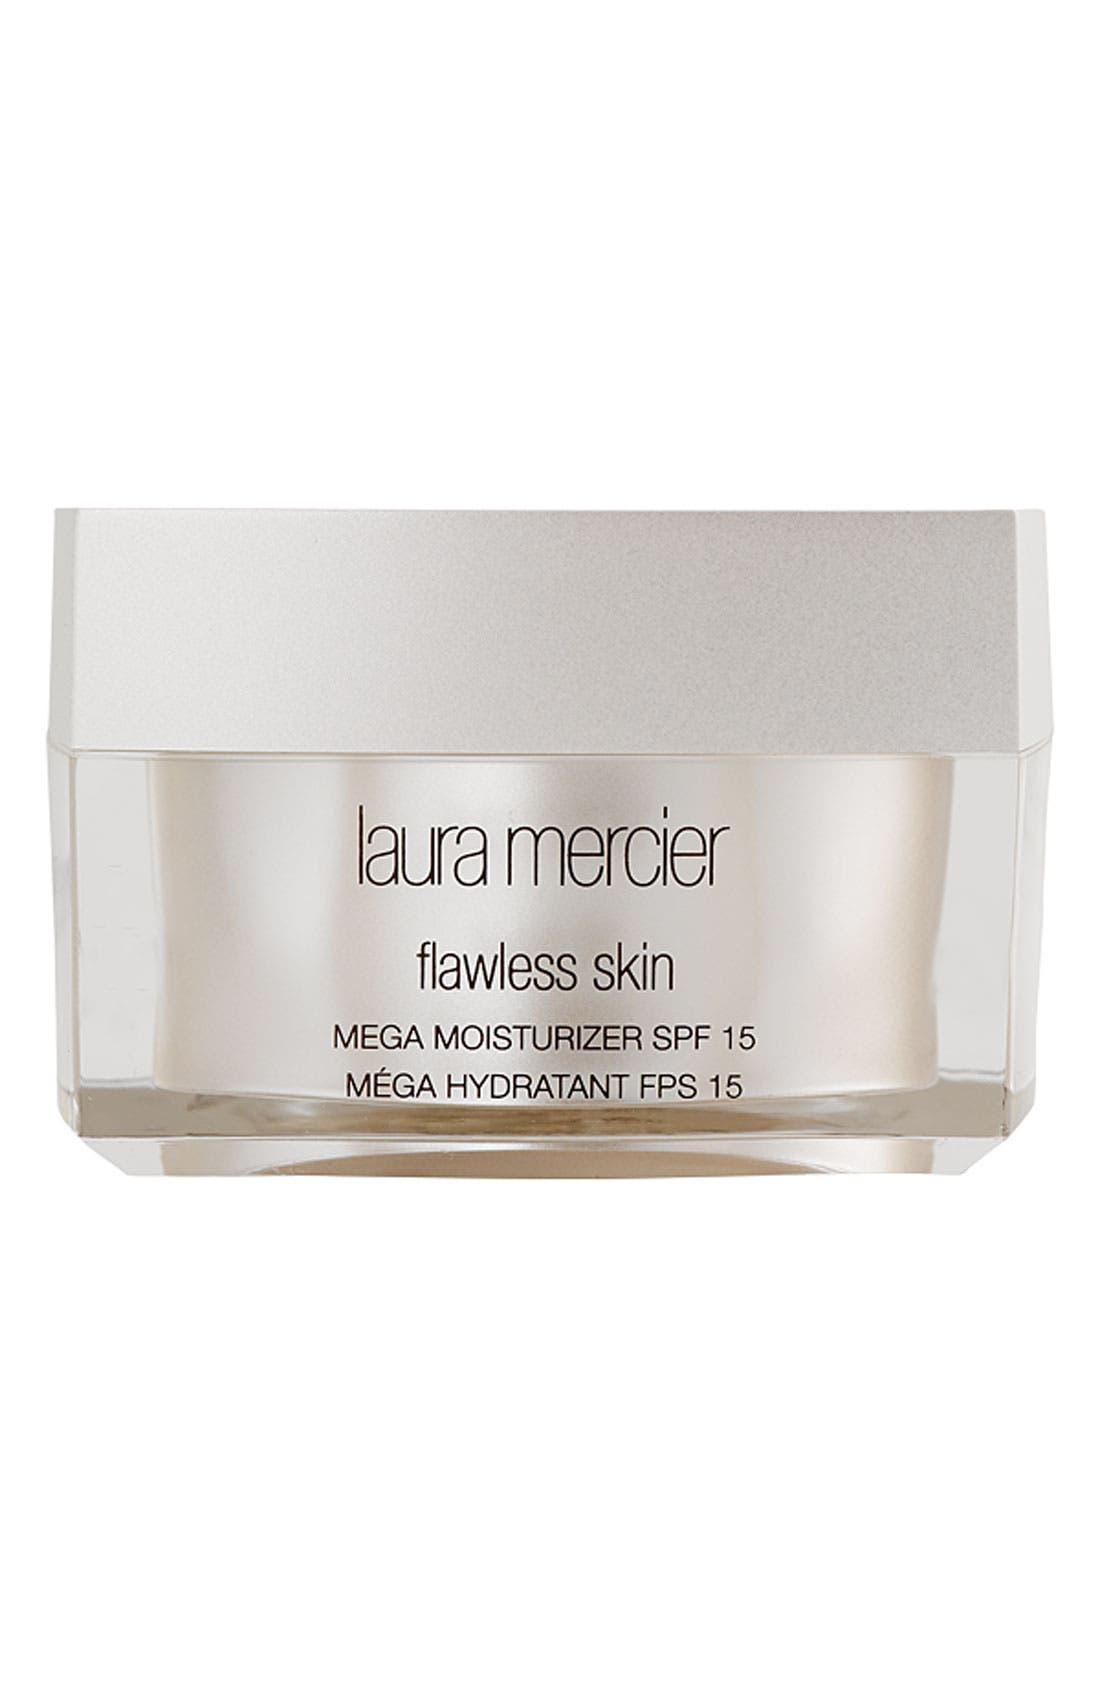 'Flawless Skin' Mega Moisturizer SPF 15 for Normal/Dry Skin,                         Main,                         color, NO COLOR